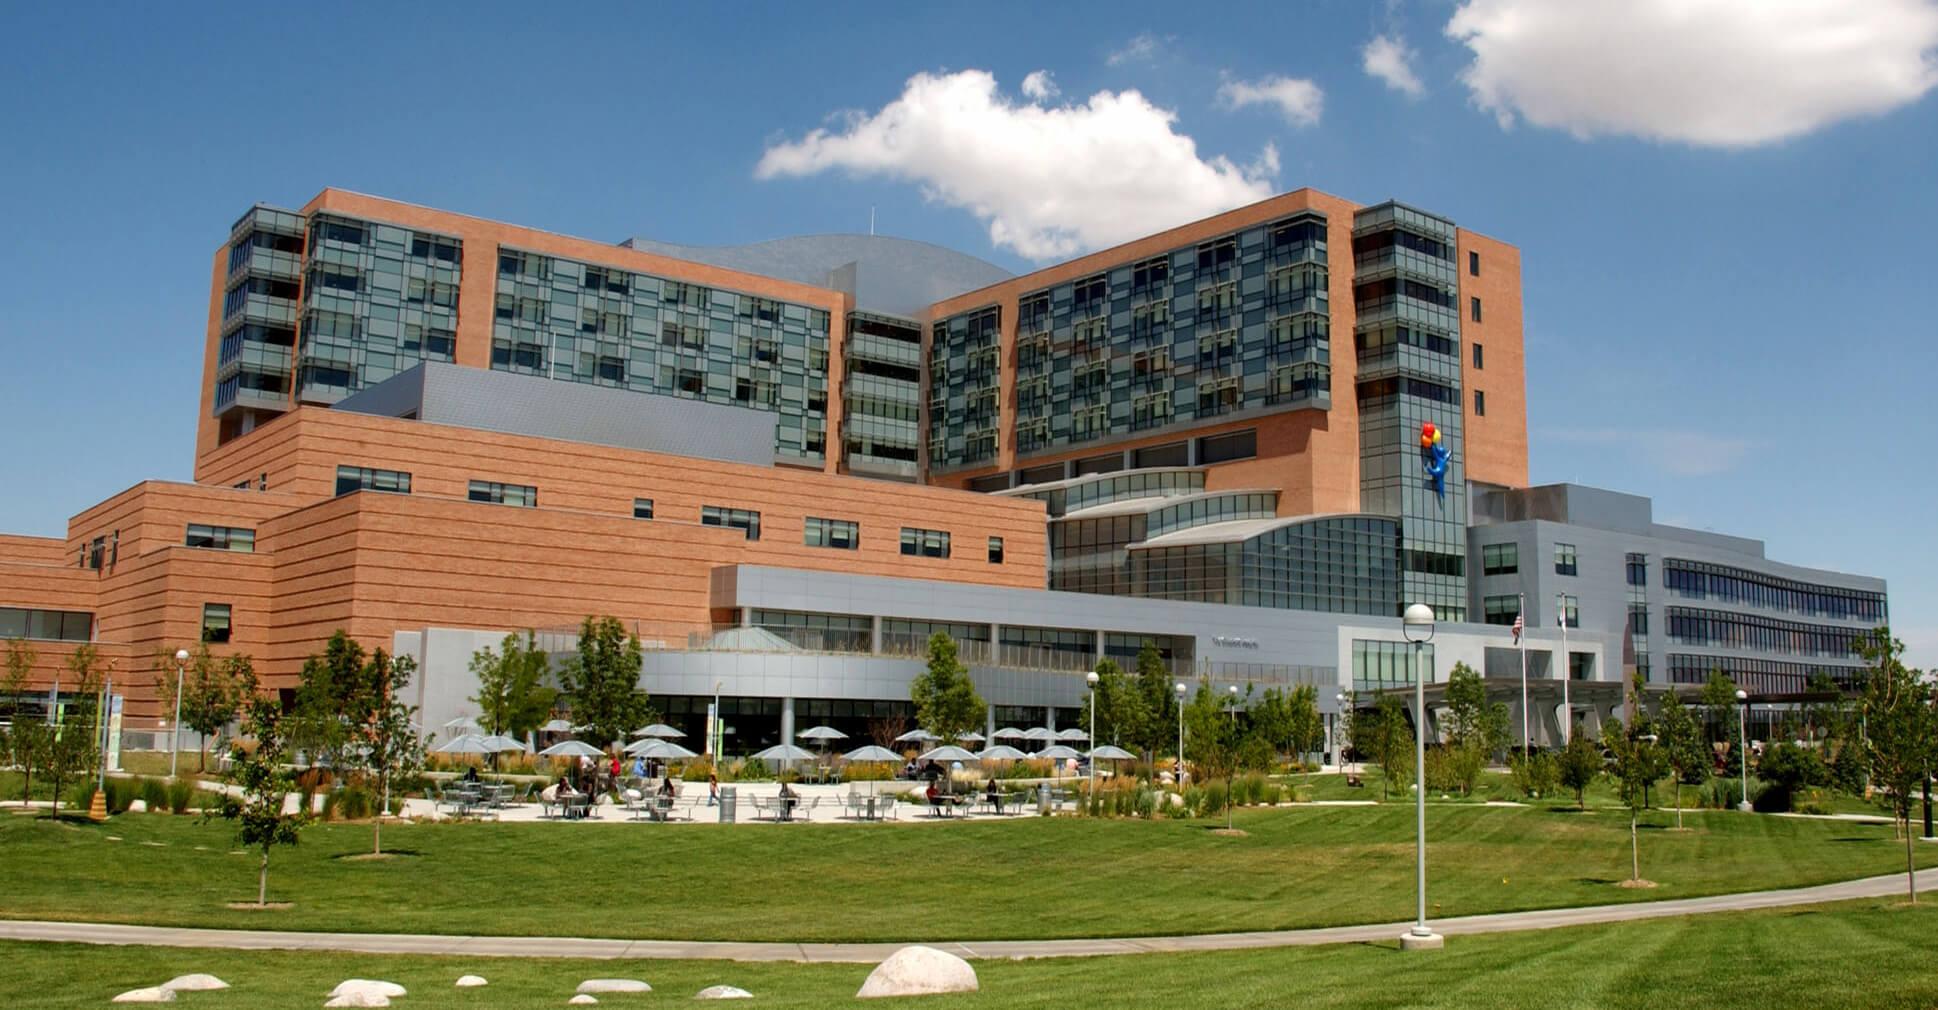 Children's Hospital Colorado Anschutz Medical Campus